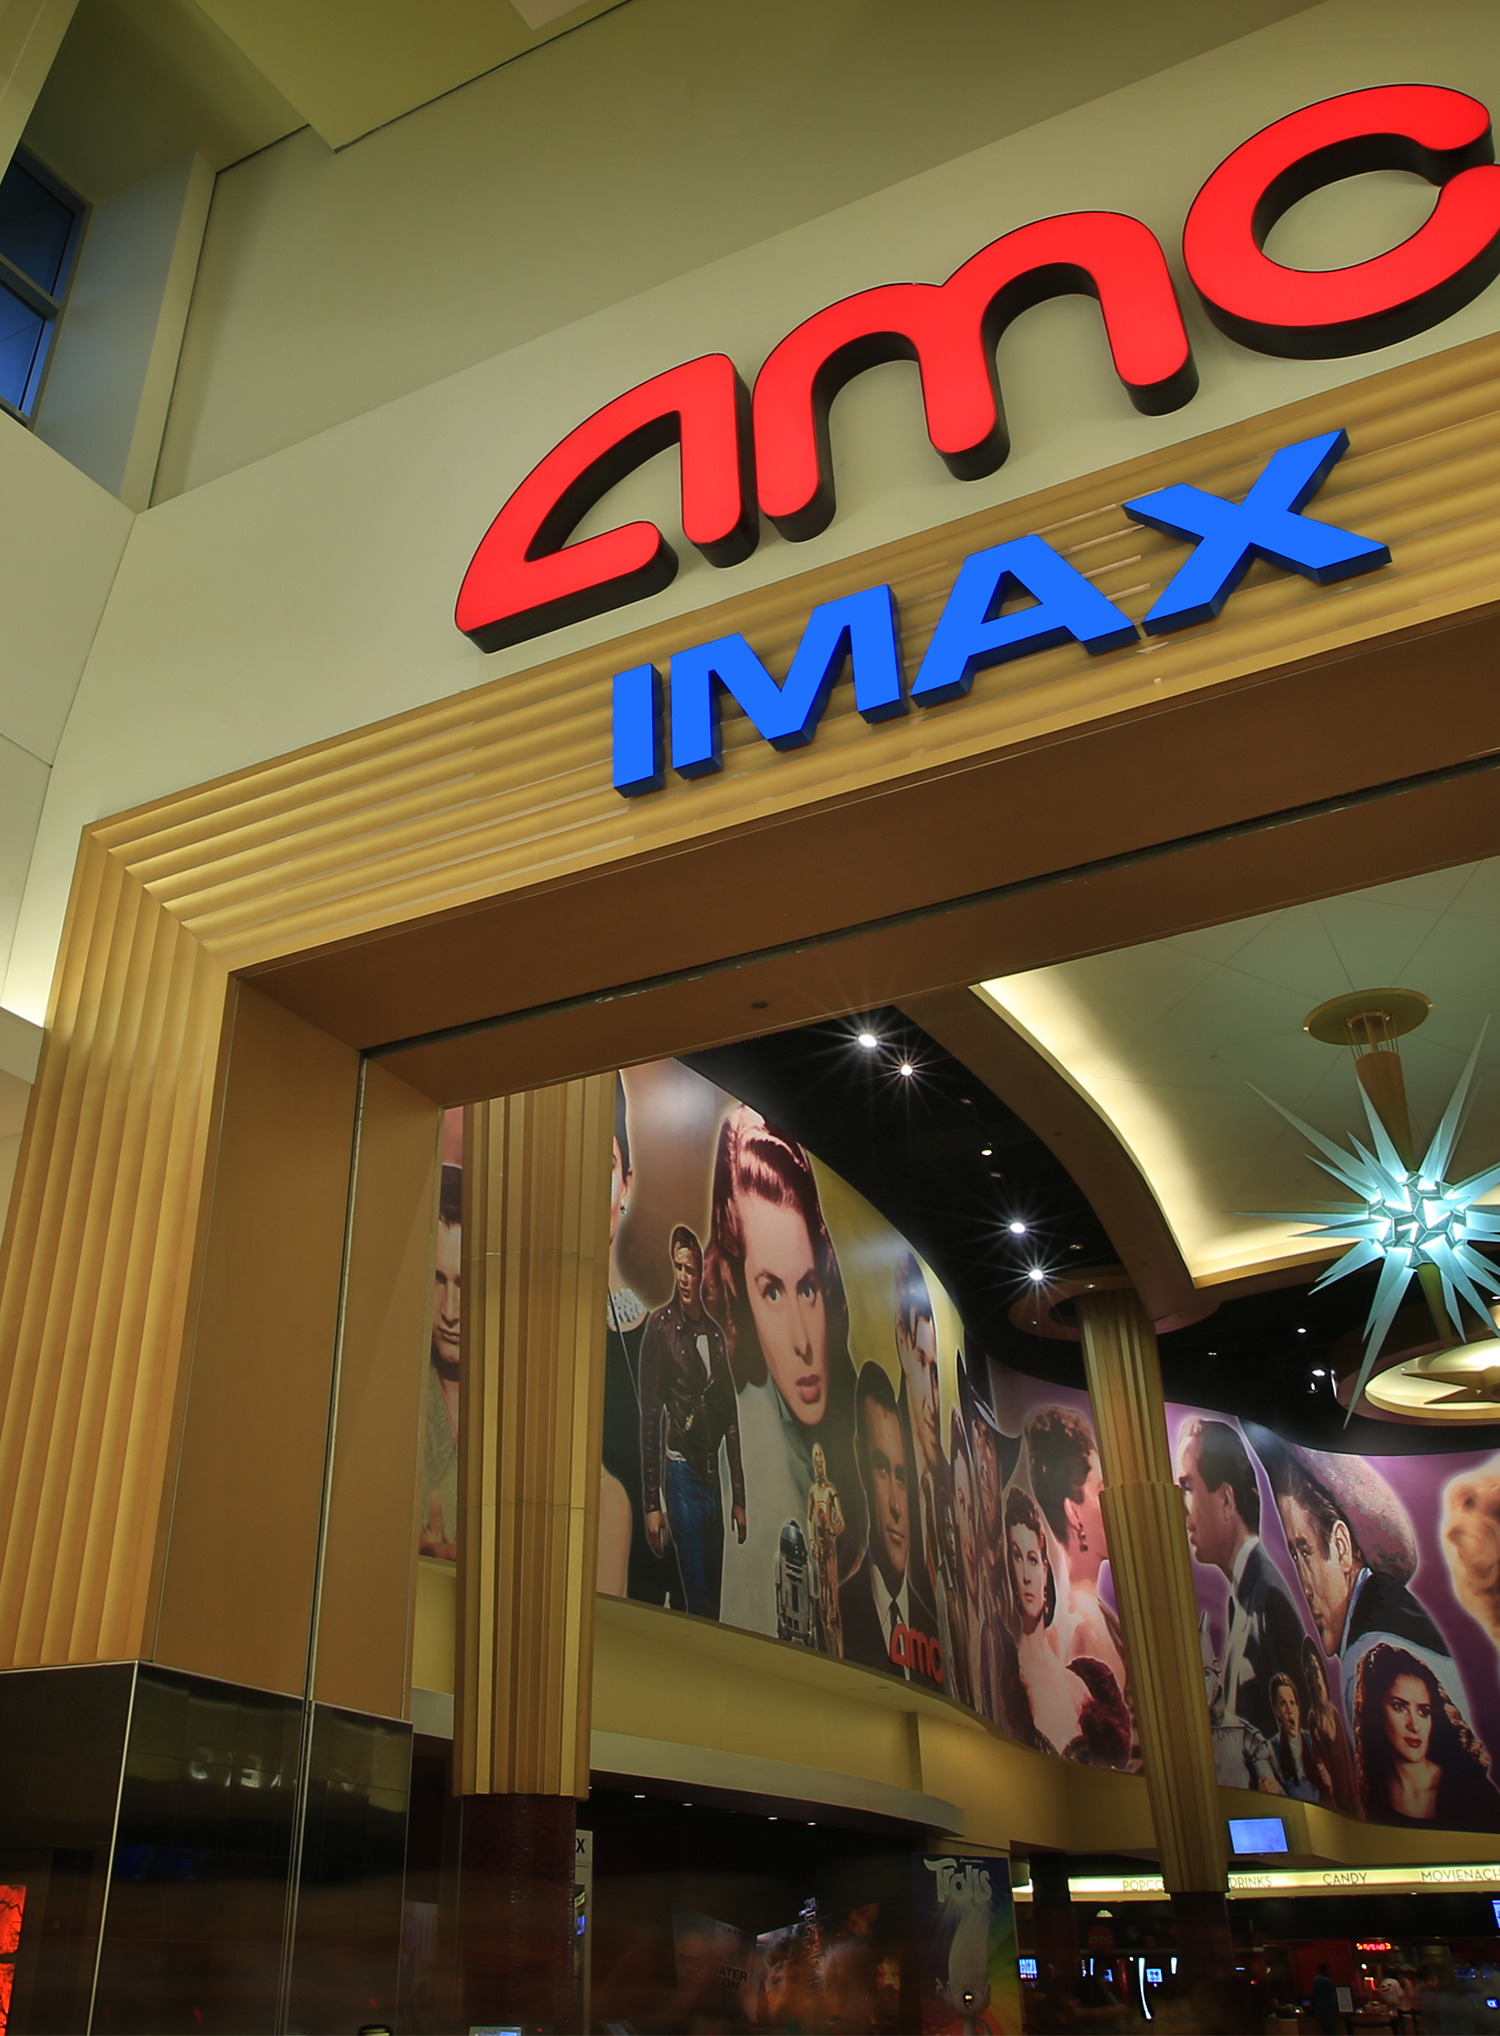 Amc Garden State 16 Paramus New Jersey 07652 Amc Theatres